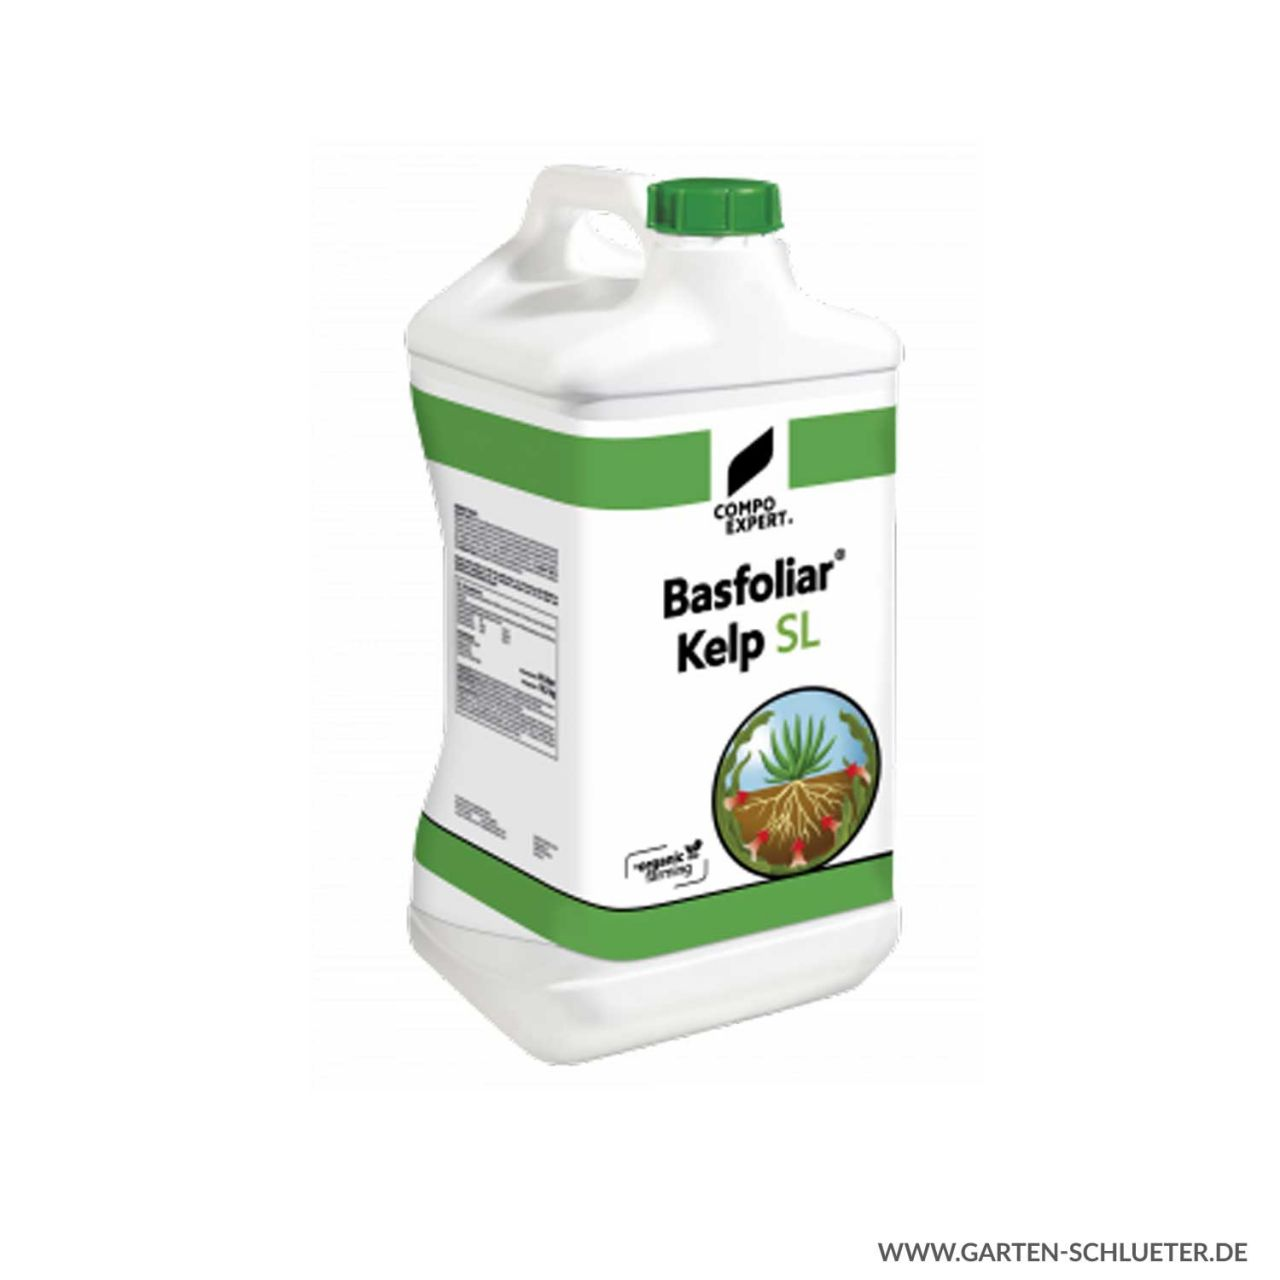 Biostimulanzien - Compo Expert® Basfoliar® Kelp SL - 10 Liter